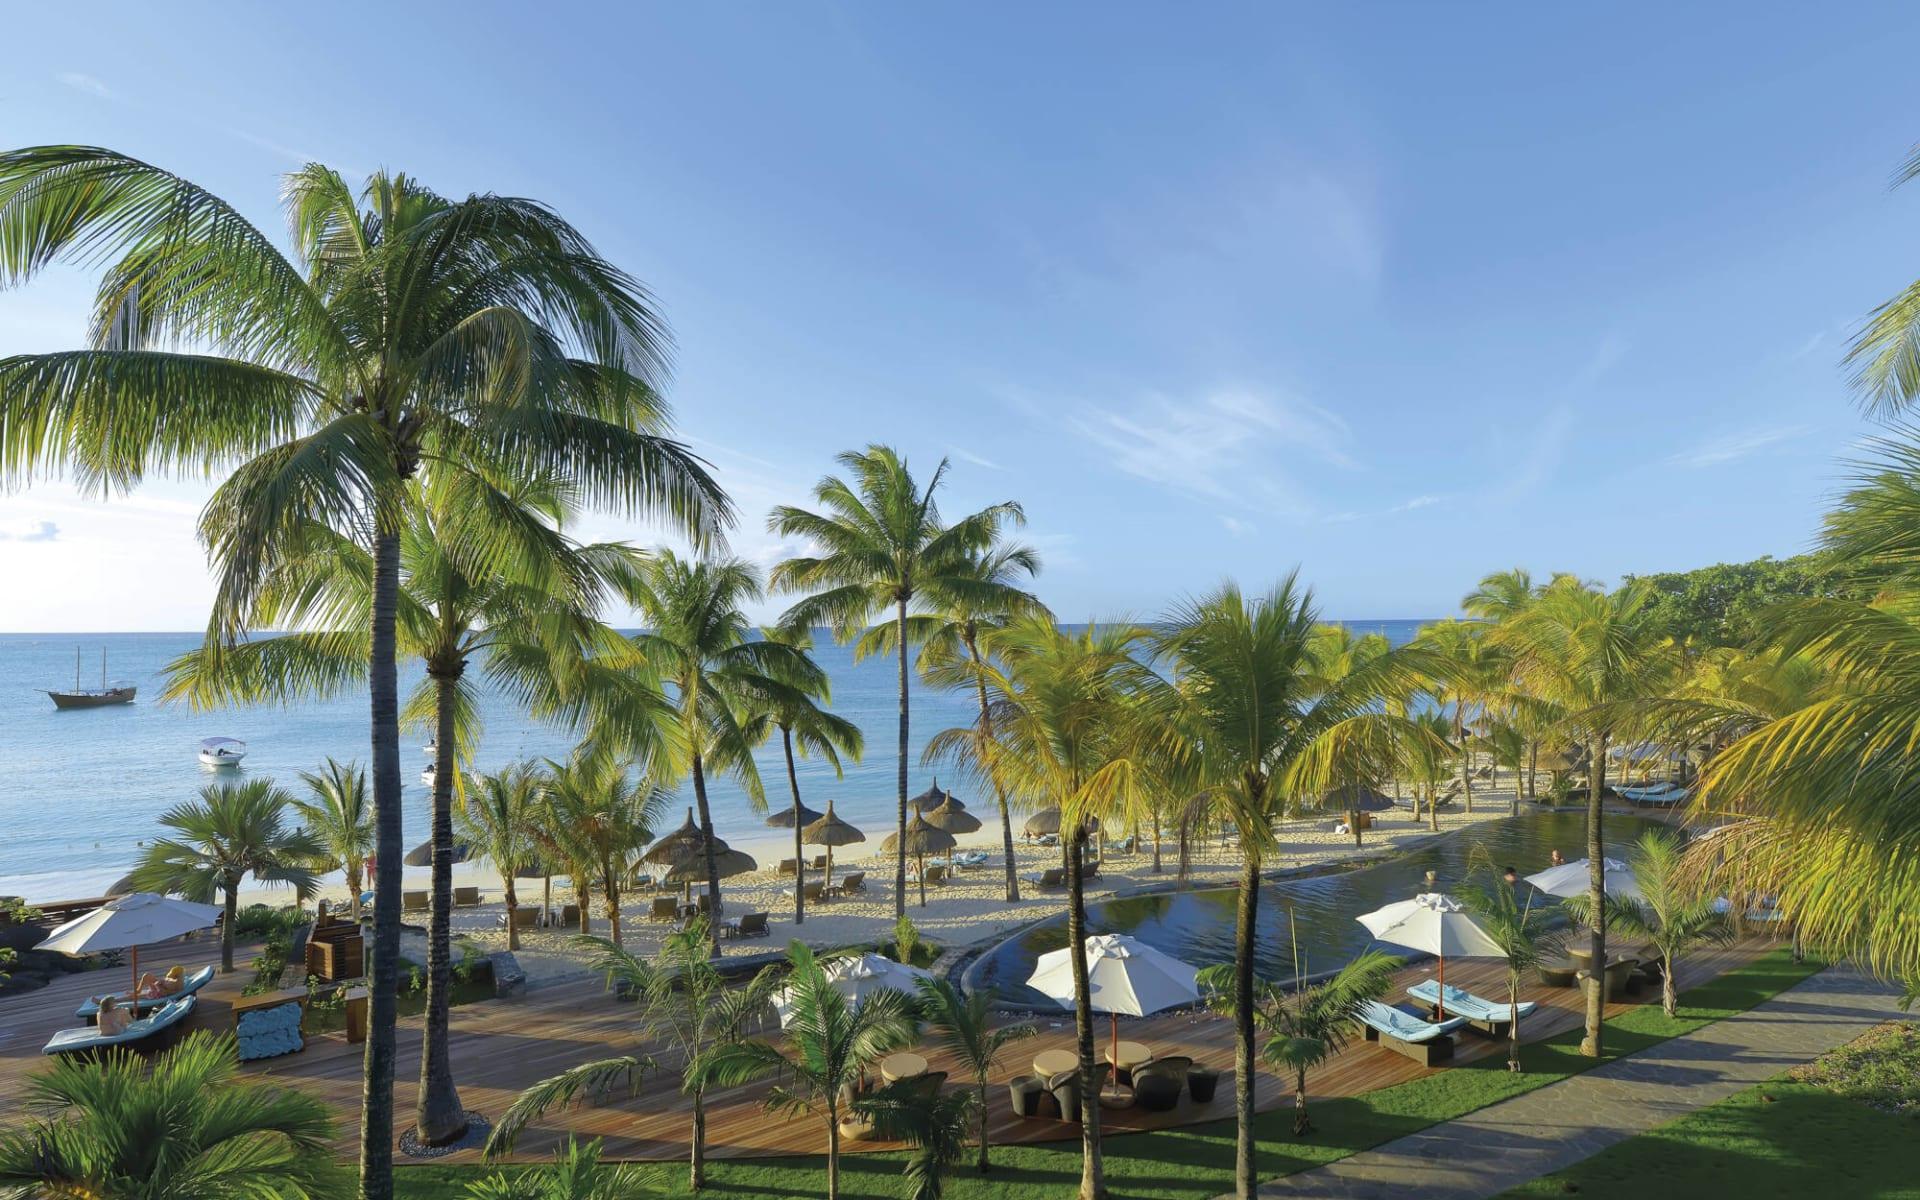 Royal Palm Beachcomber Luxury in Grand Baie: